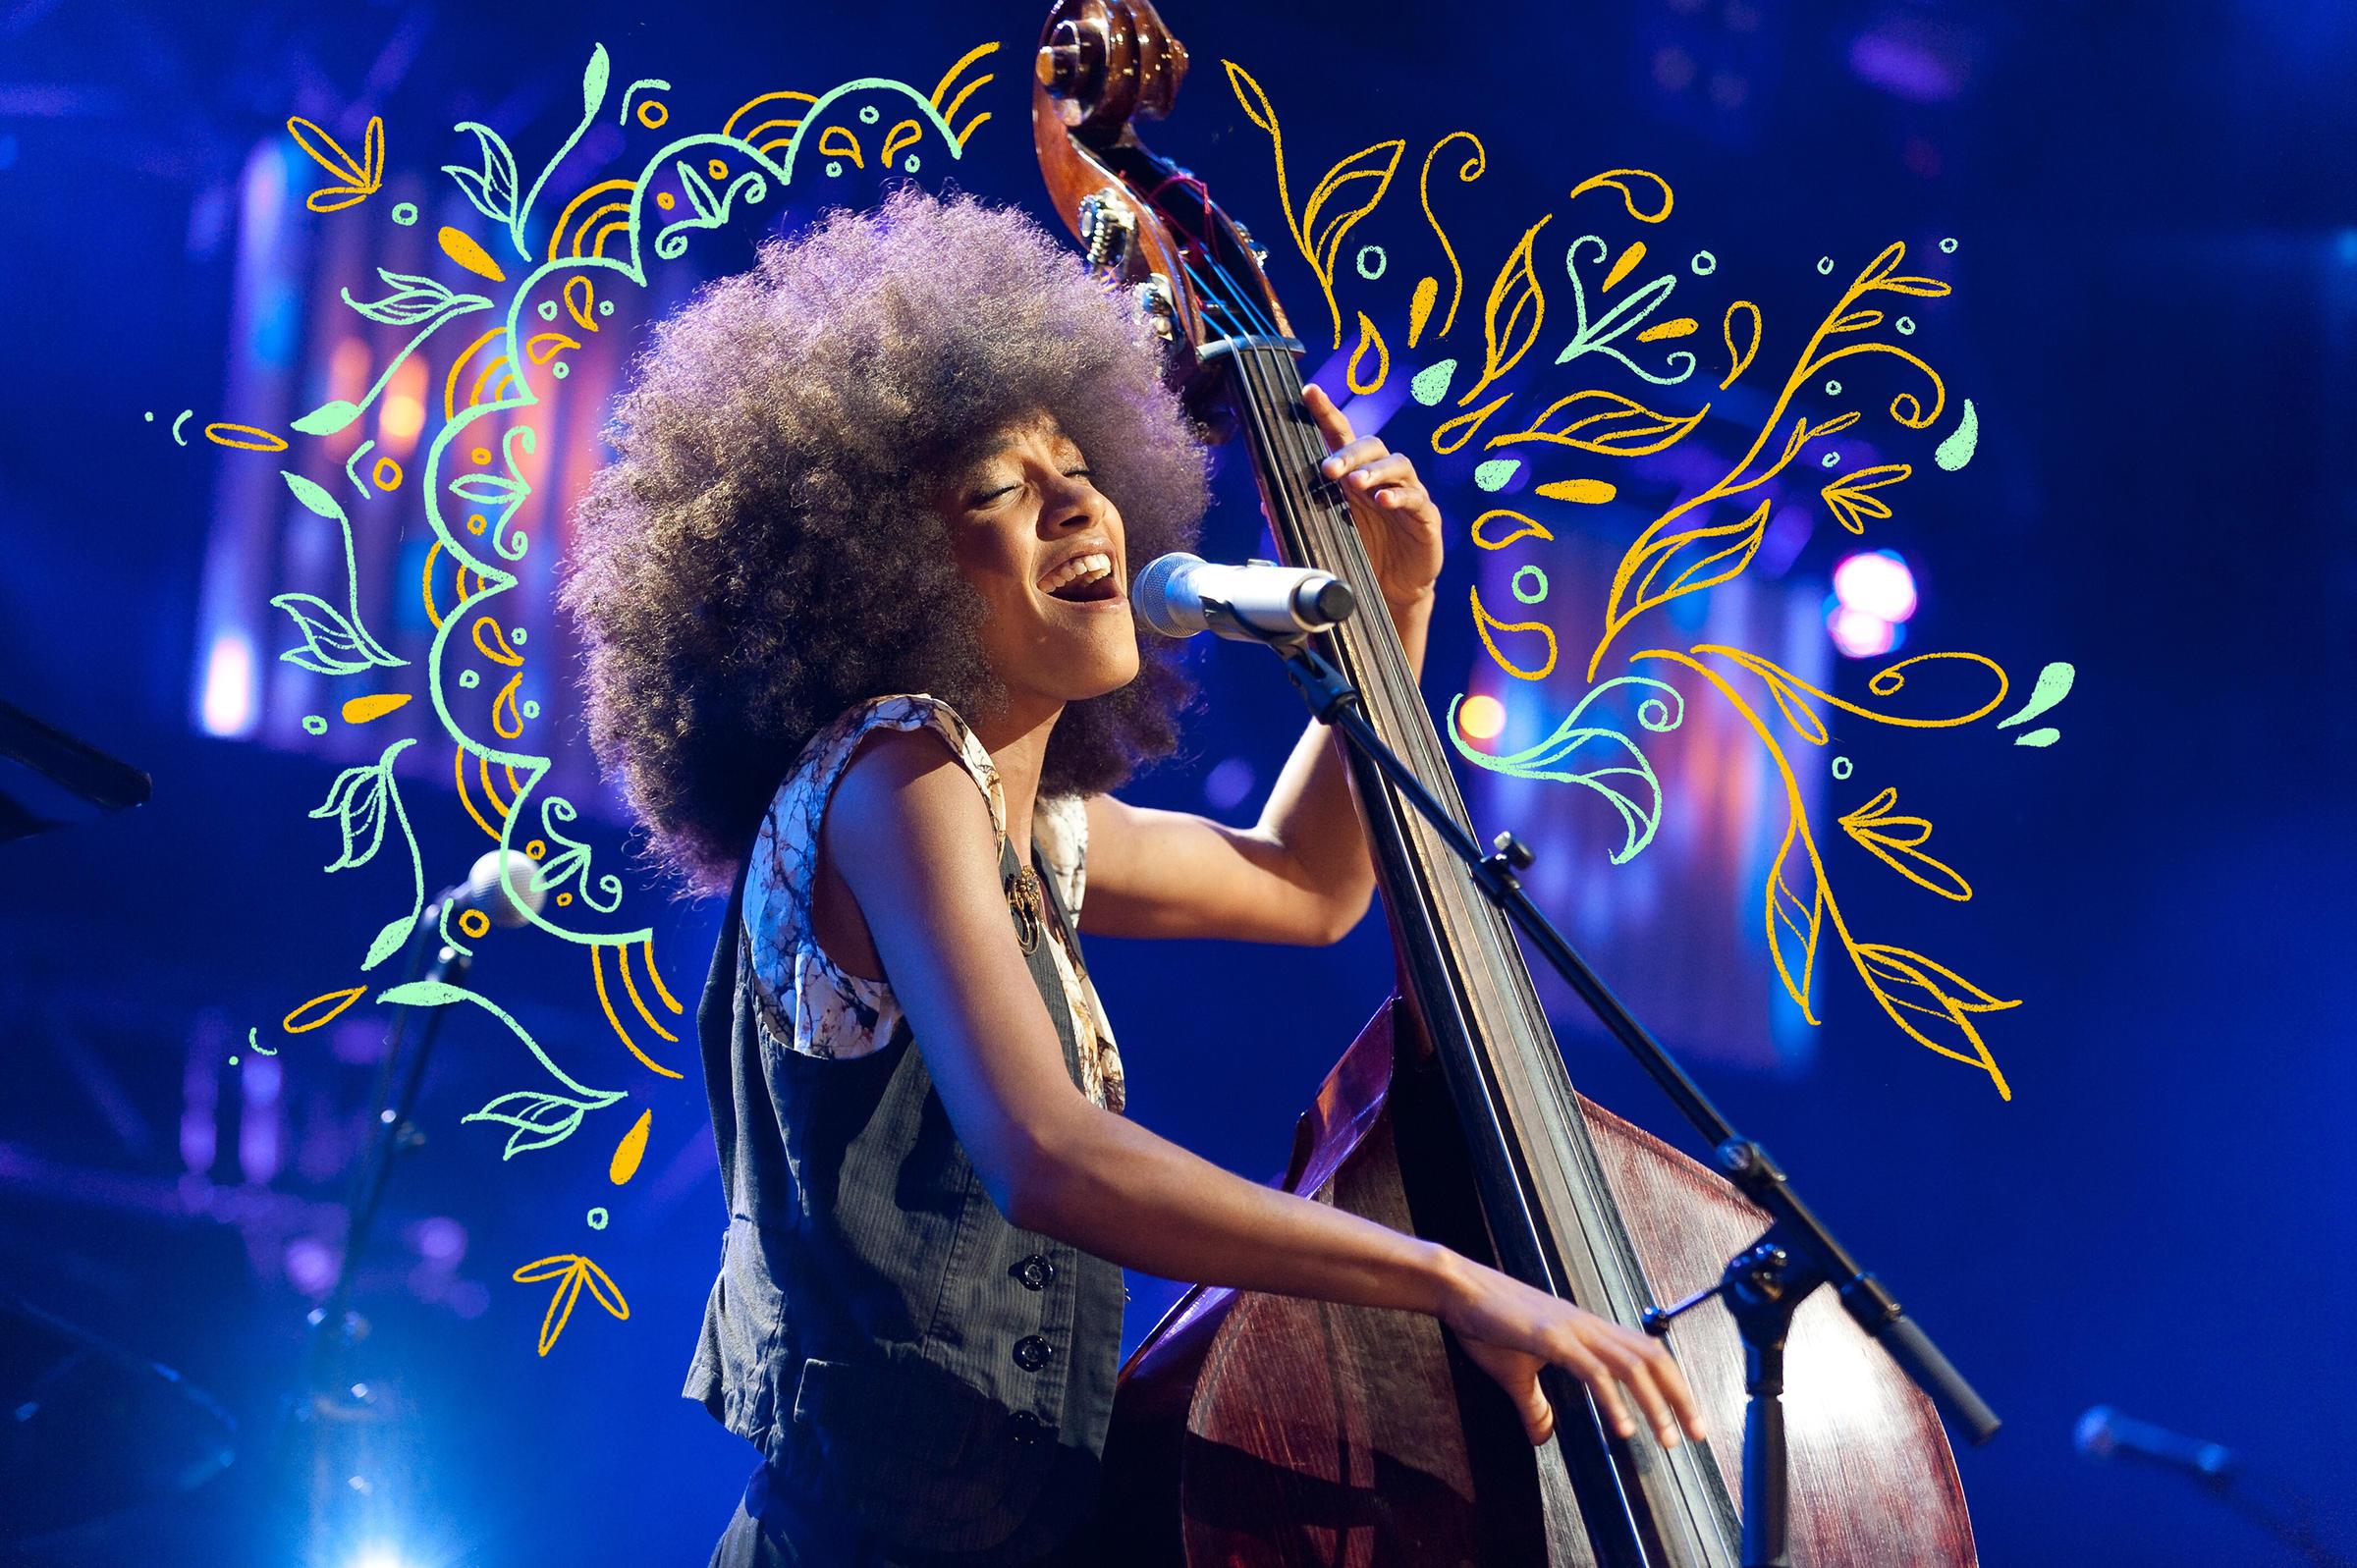 esperanza spalding is the 21st century s jazz genius texas public